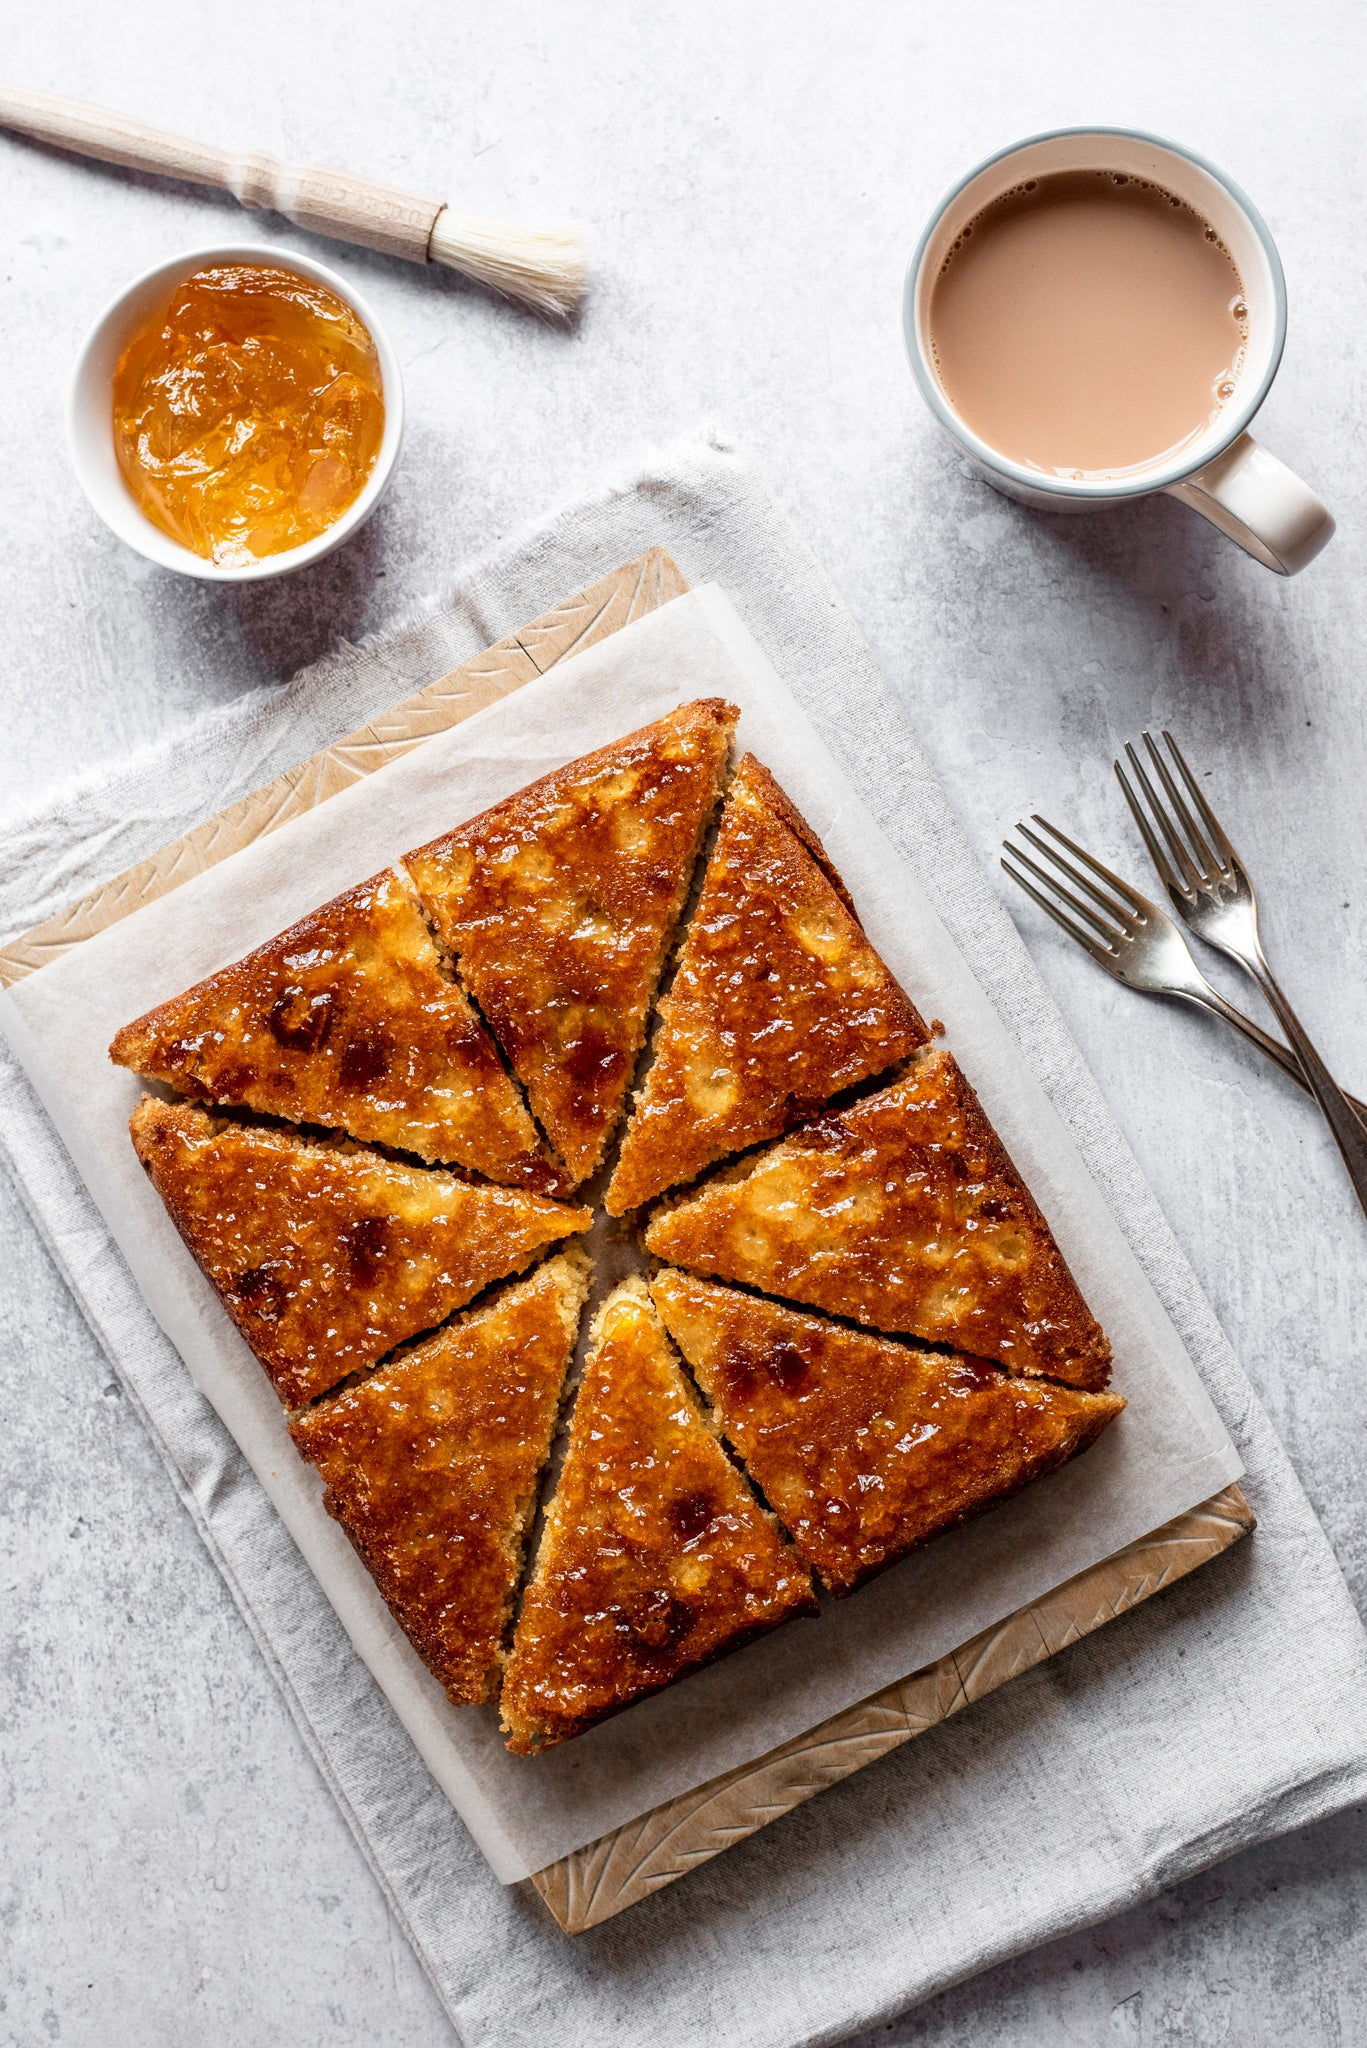 Tangy marmalade cake